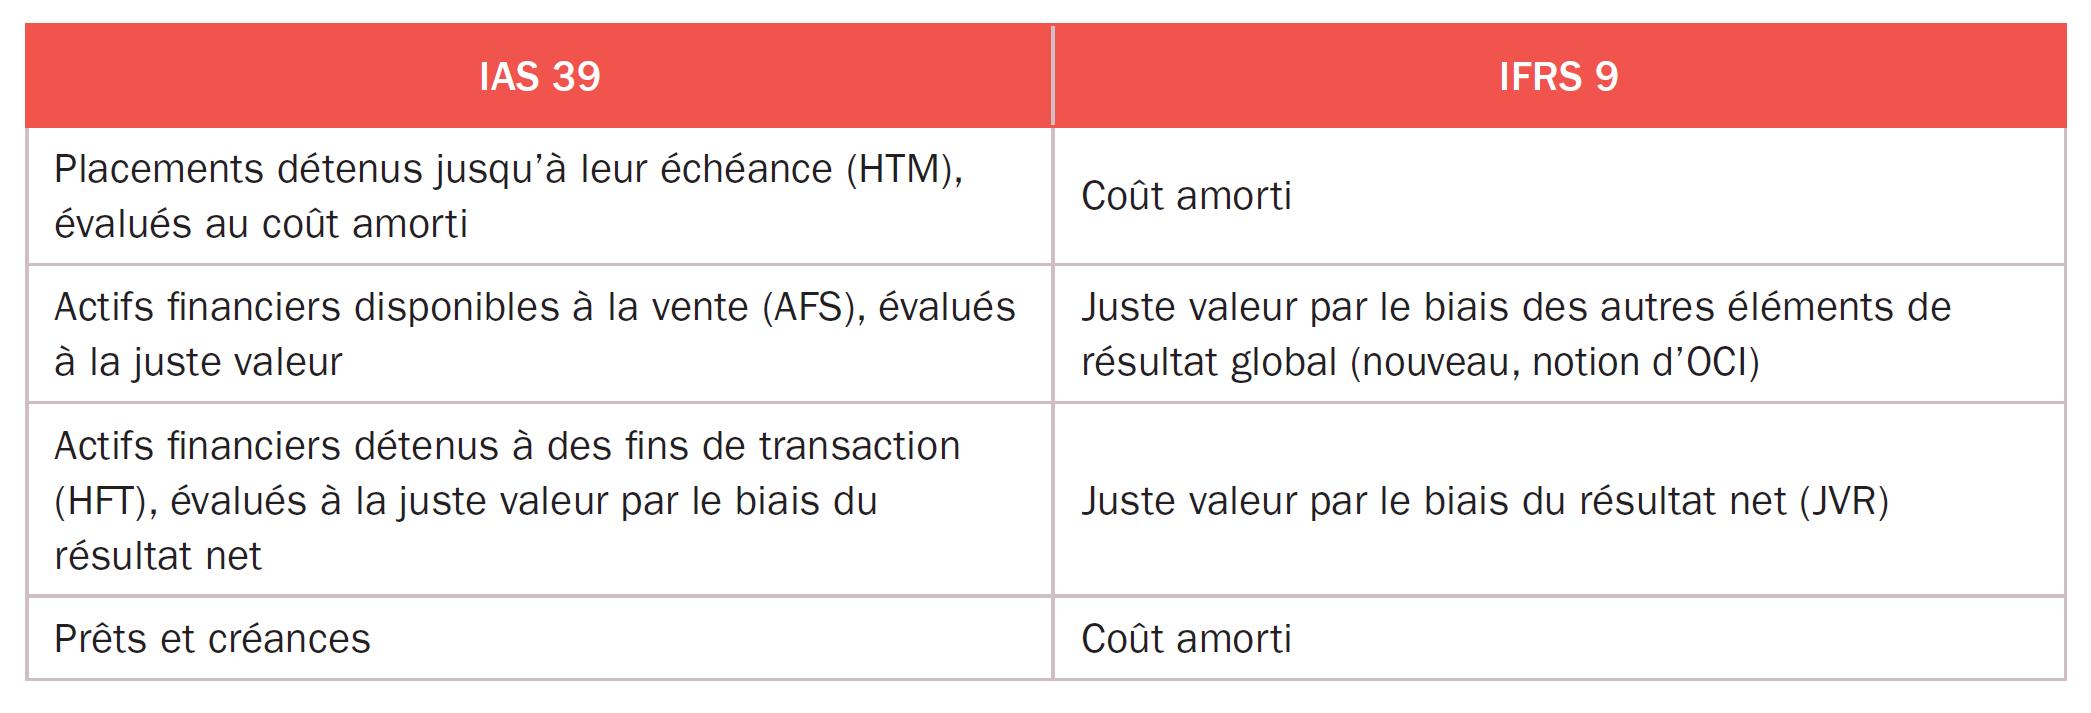 IAS 39 et IFRS 9